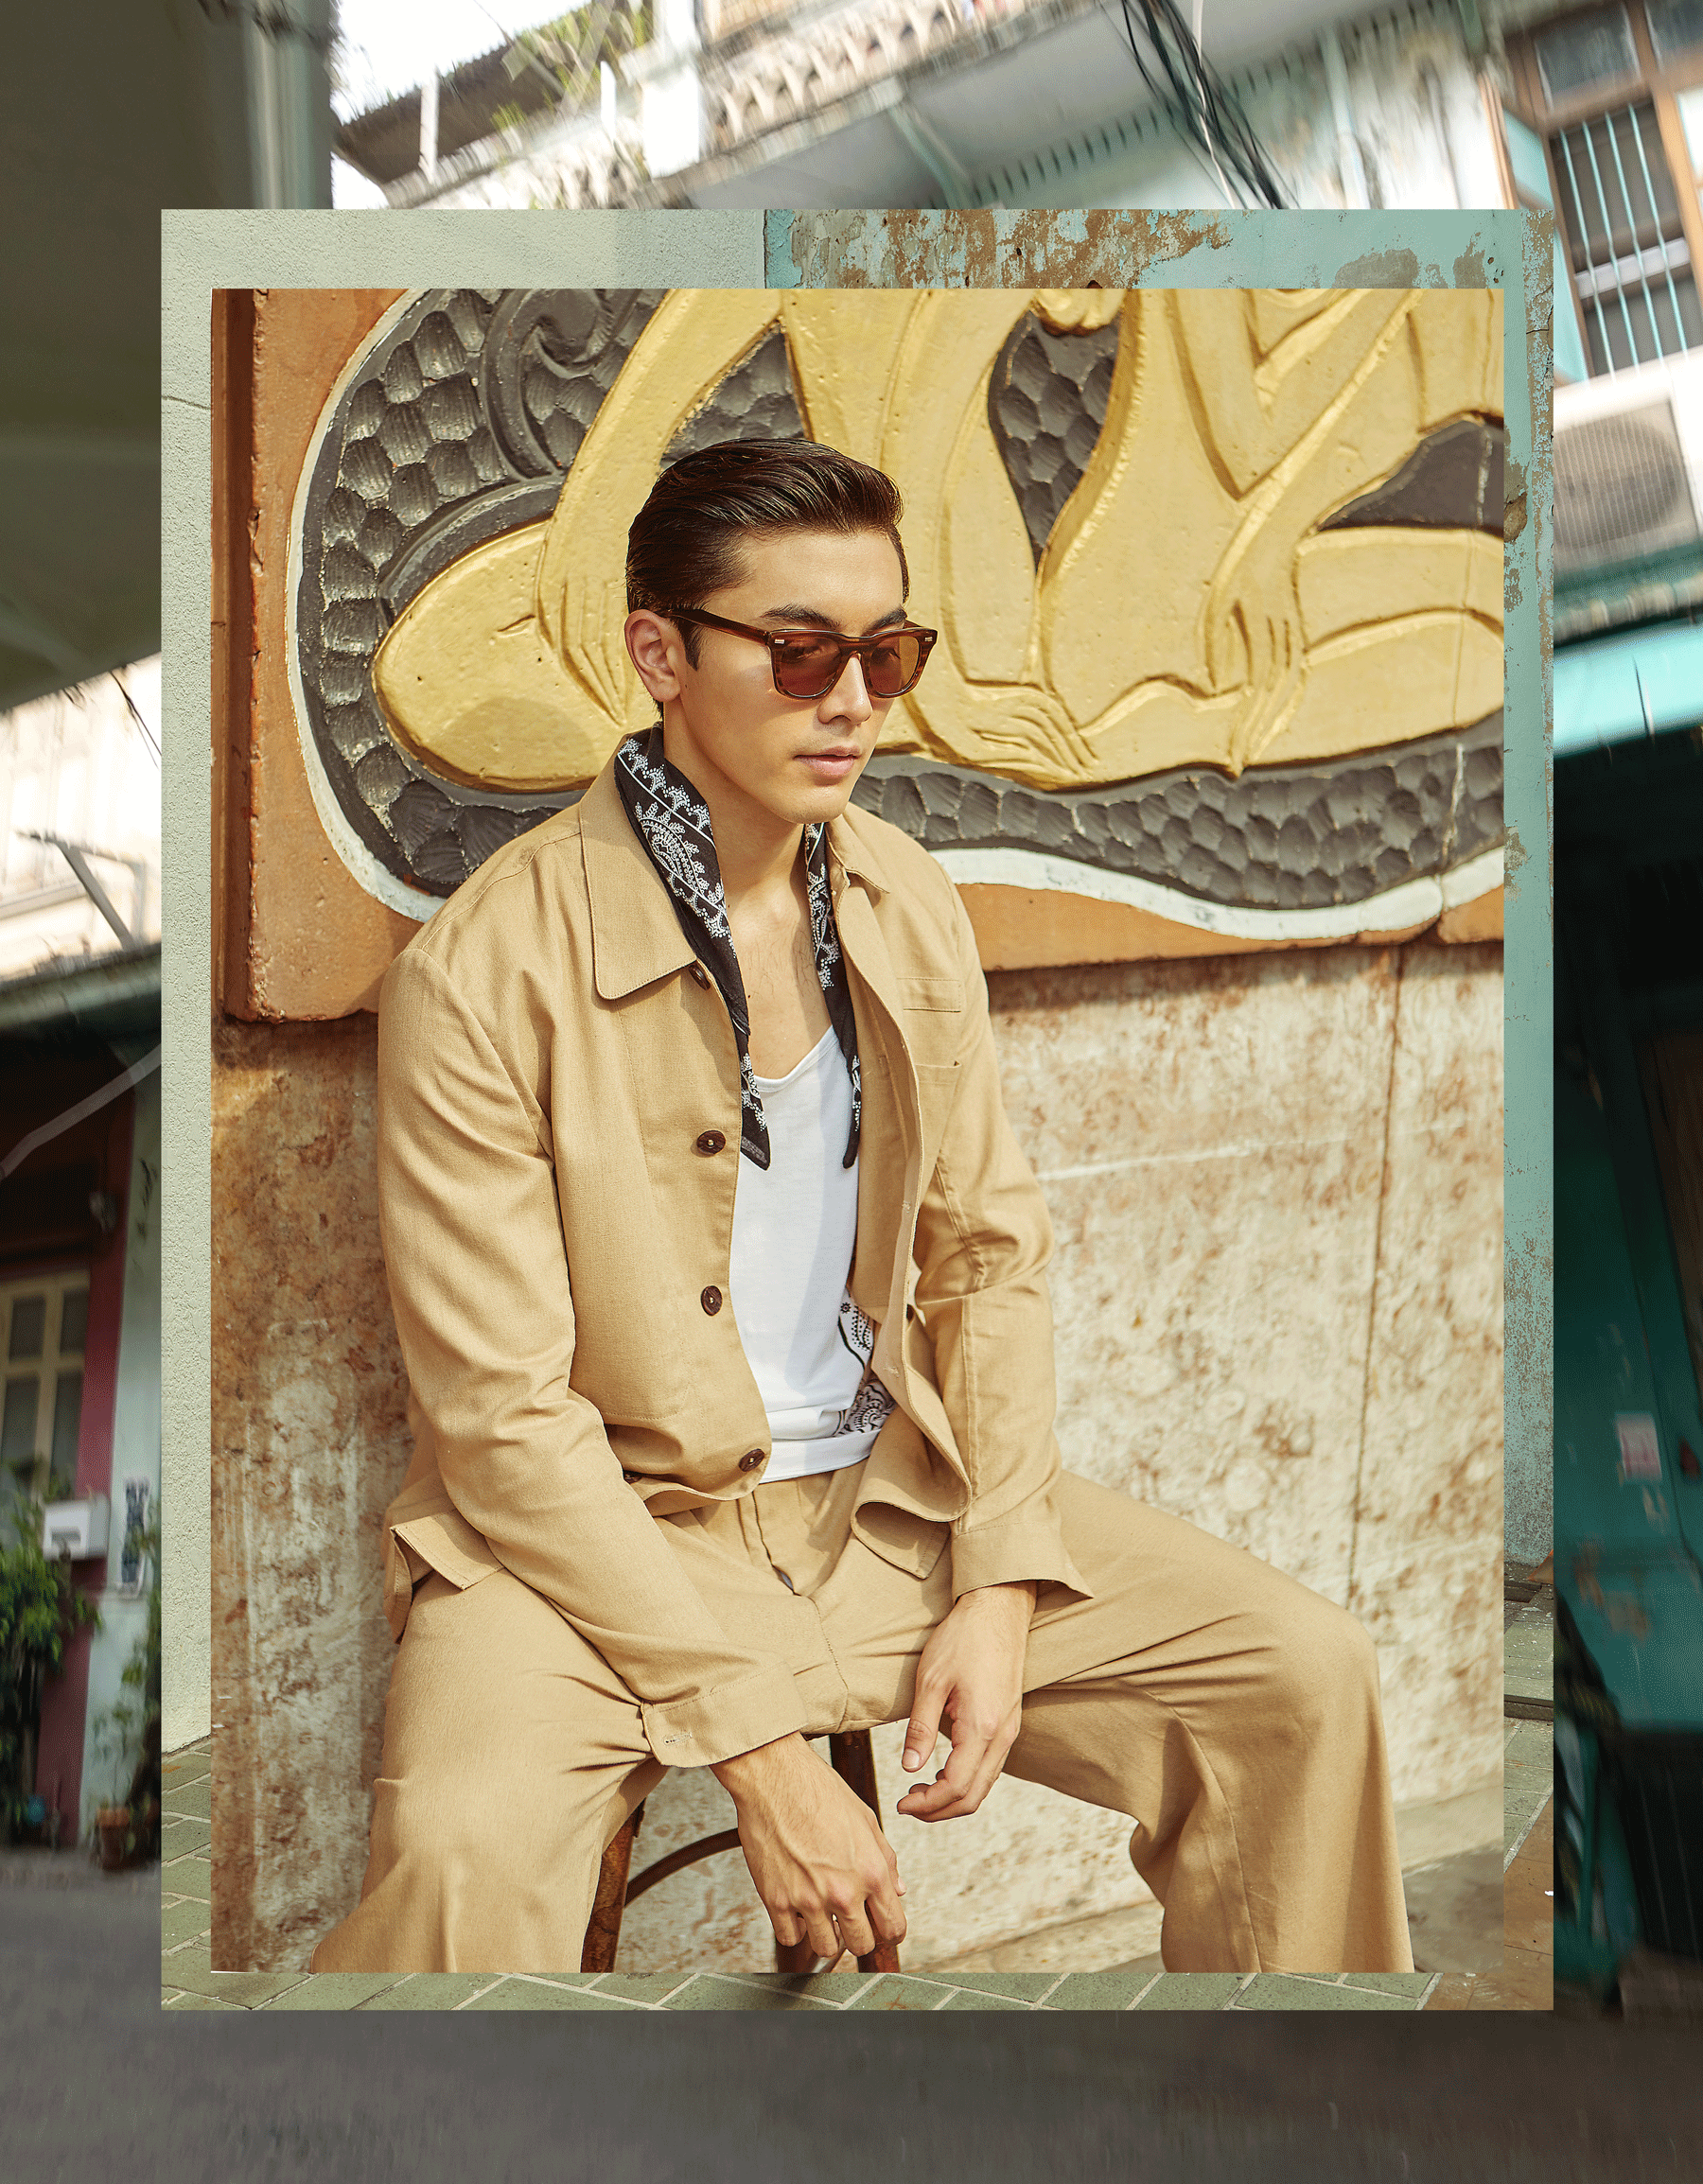 clothes : PAINKILLER / sunglasses : Blake Kuwahara